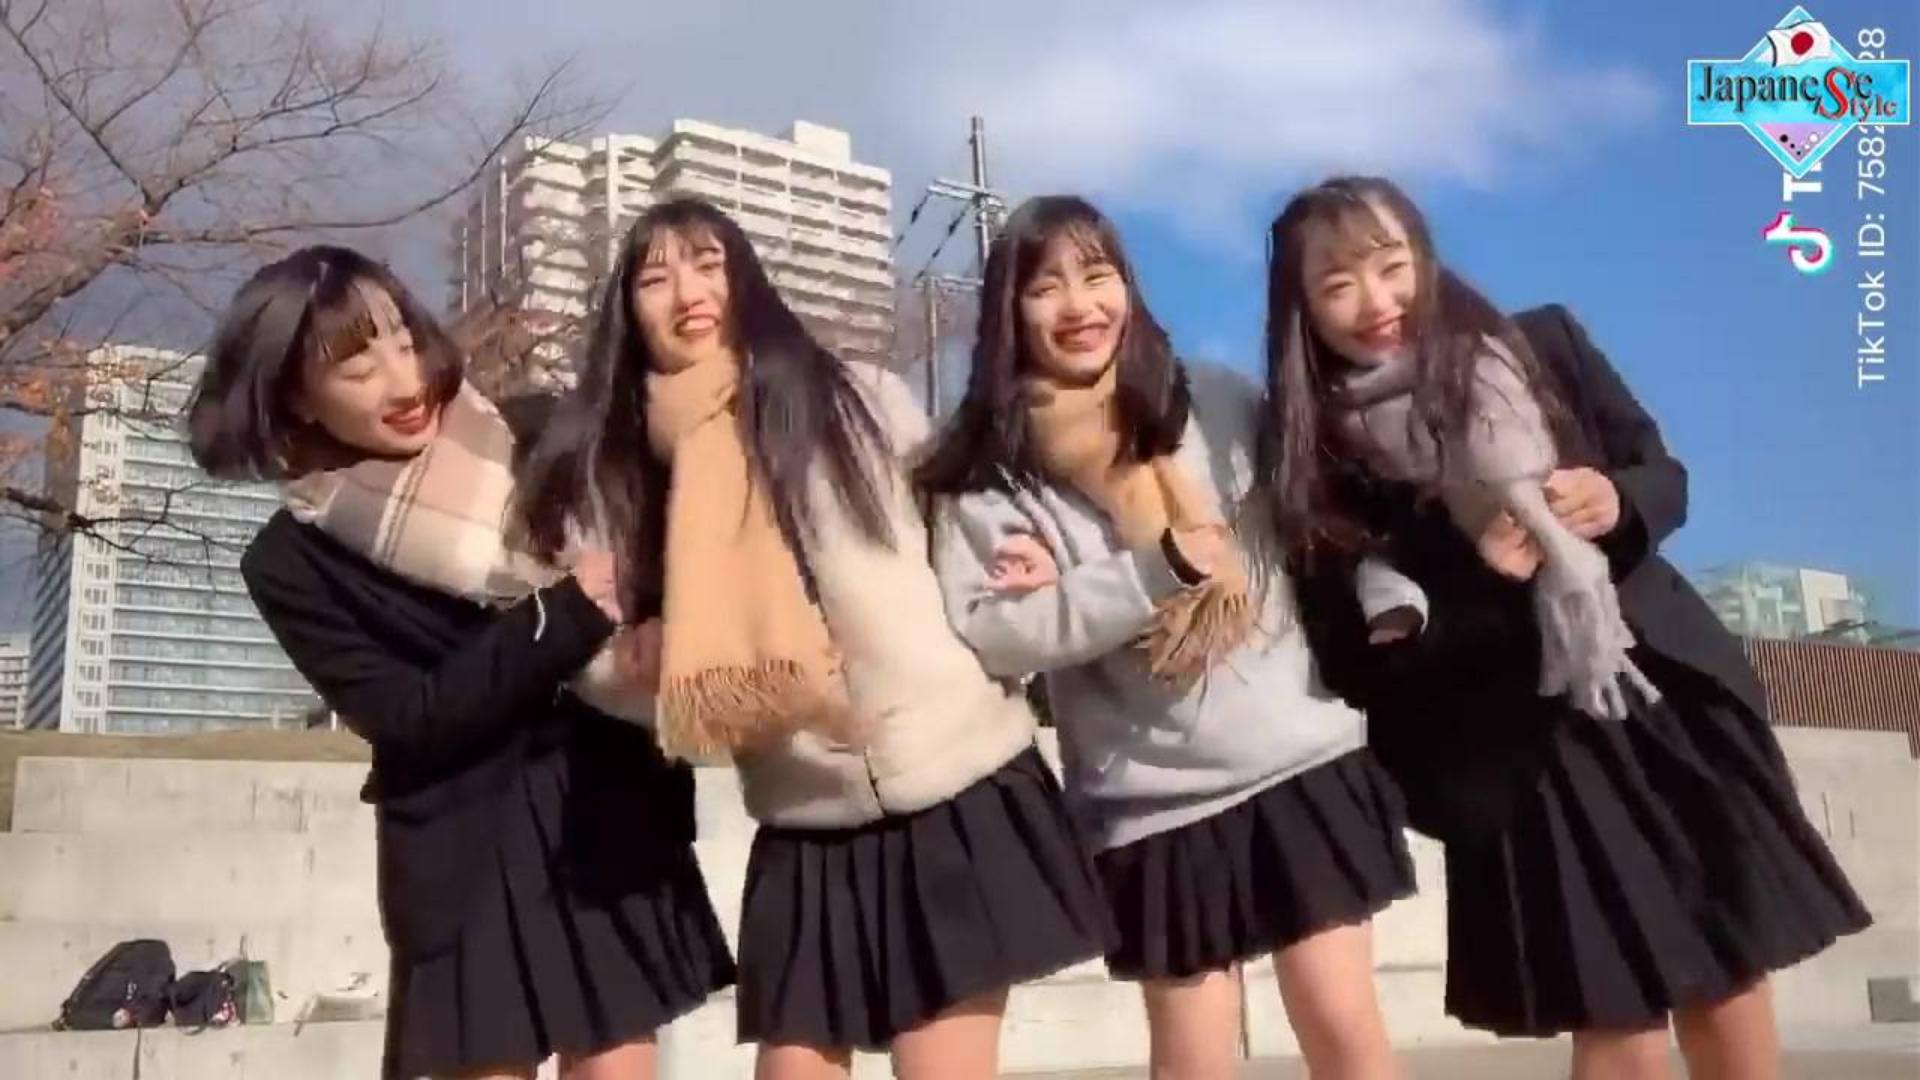 【Tik Tok 精选】日本的高中生活系列Part4